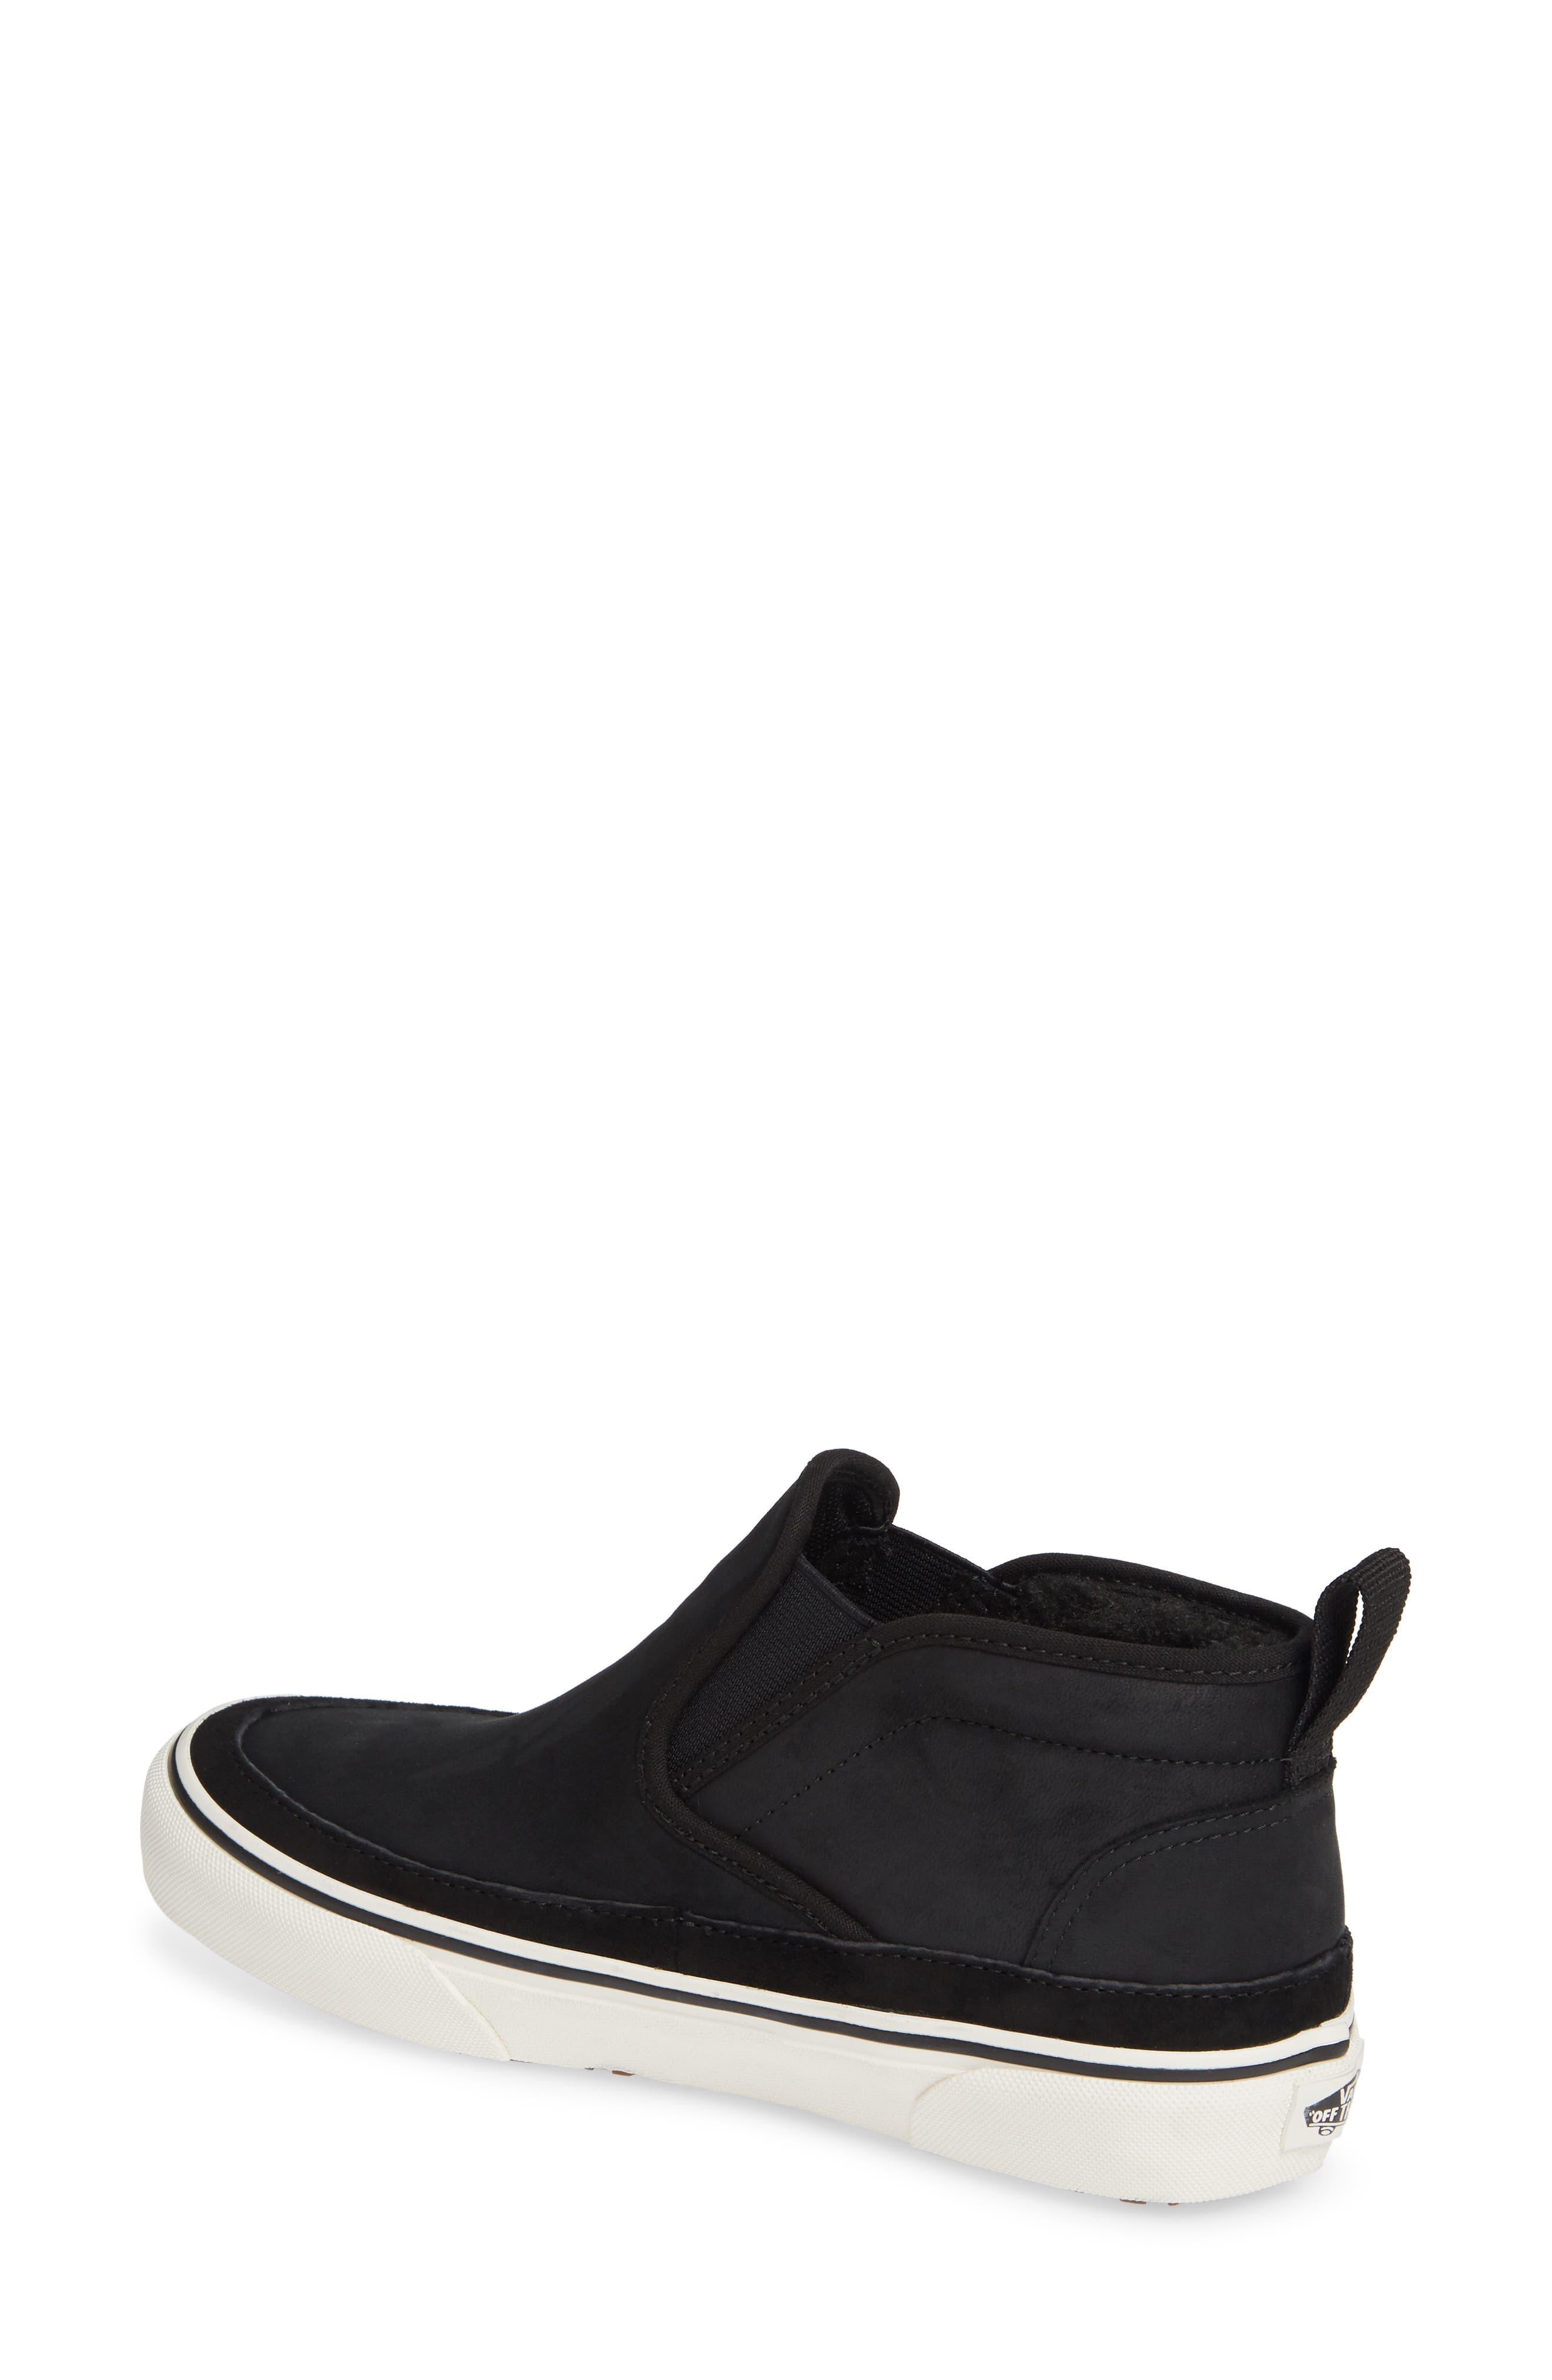 UA Authentic MTE Slip-On Sneaker,                             Alternate thumbnail 2, color,                             BLACK/ MARSHMALLOW